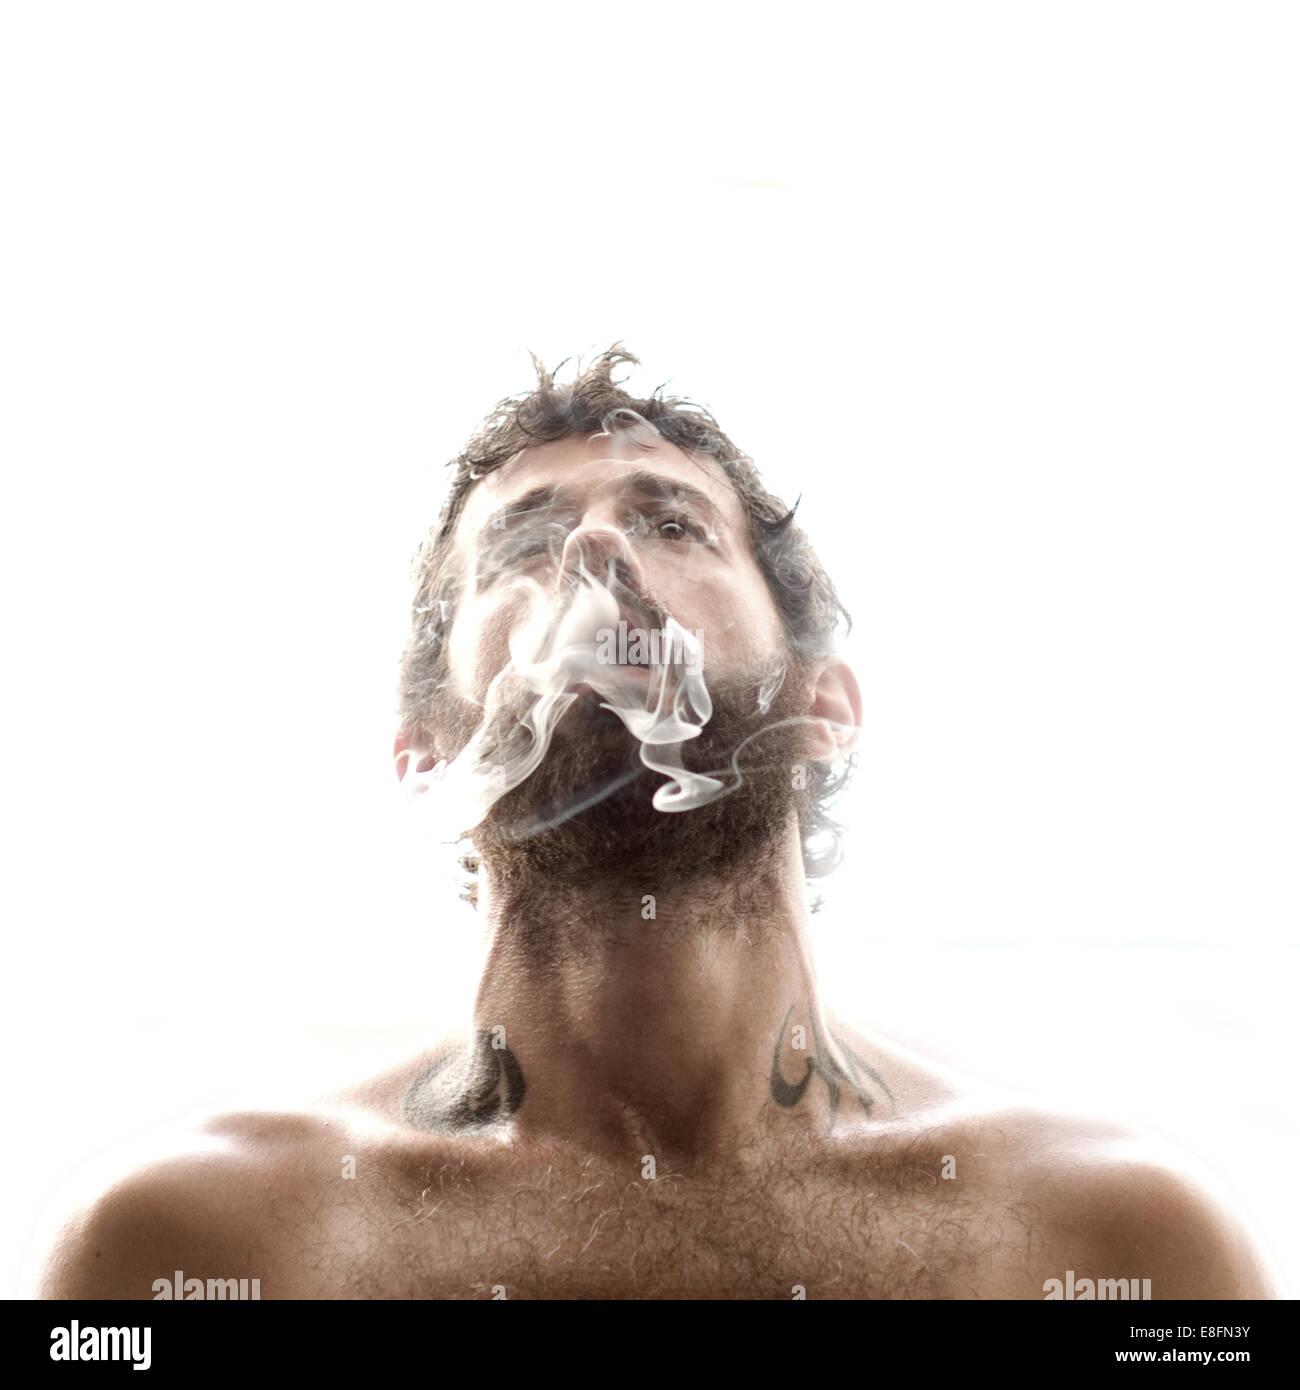 Mann Rauch Ausatmen Stockbild